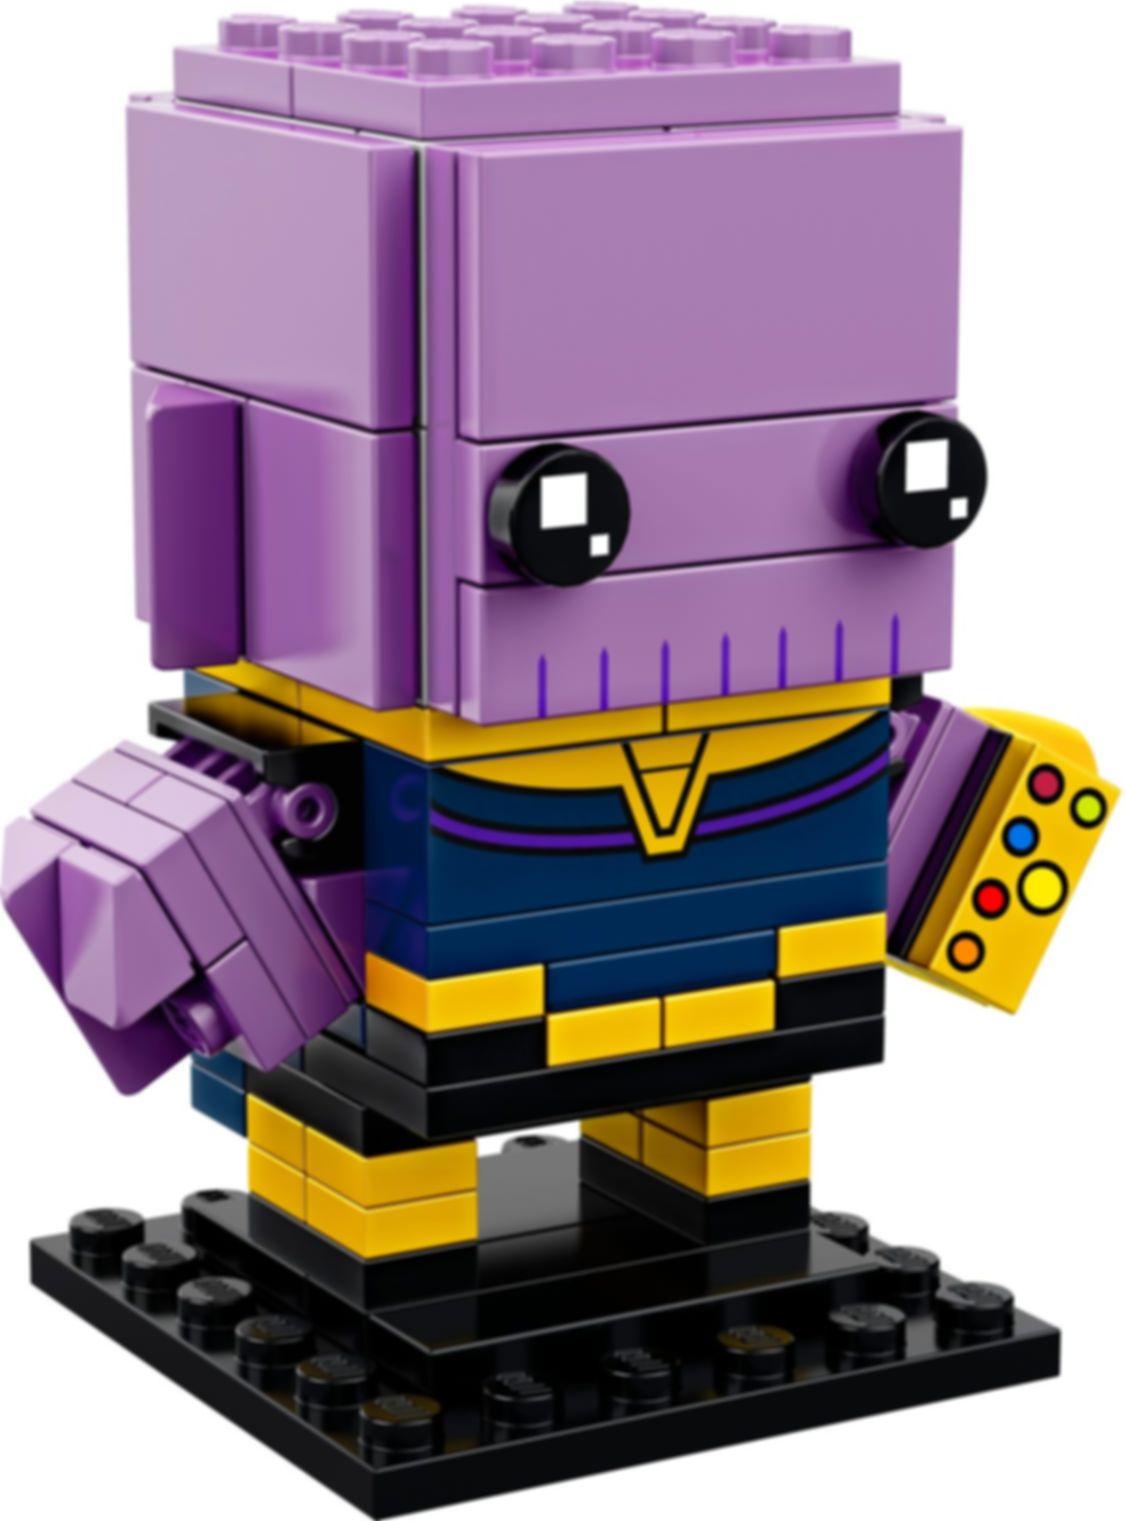 LEGO® BrickHeadz™ Thanos components